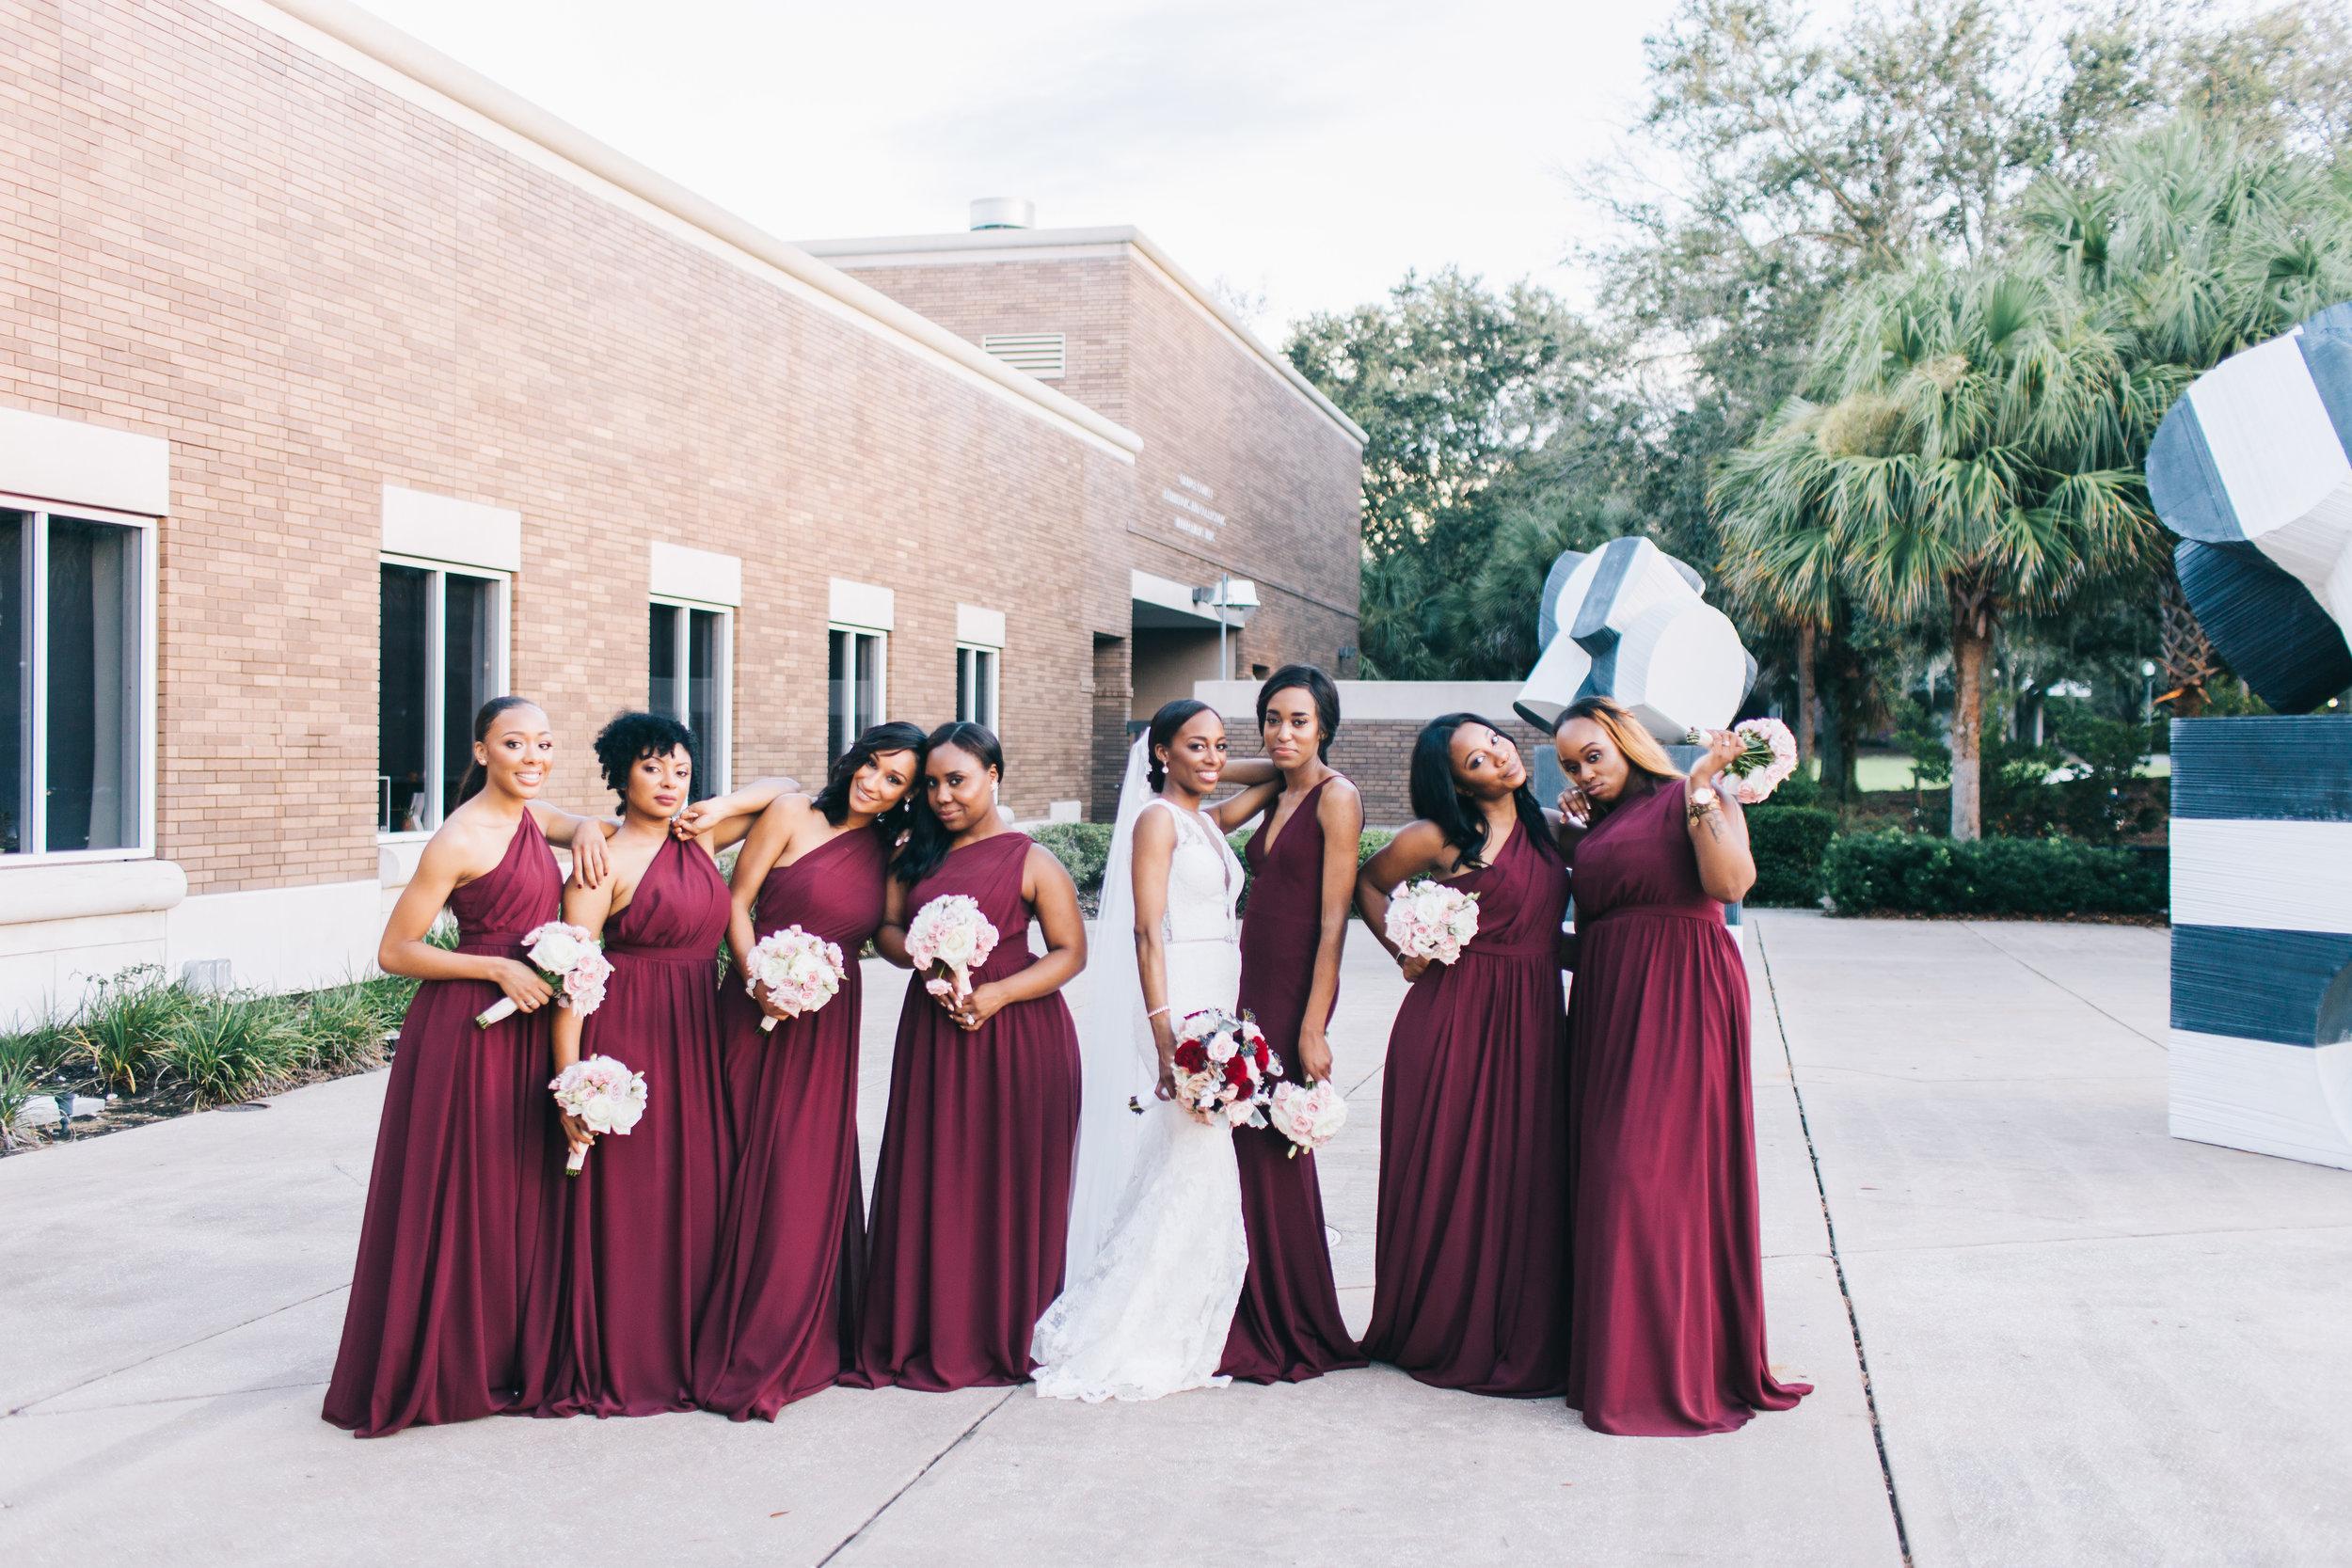 Bluegrass Chic - Burgundy and Navy Wedding